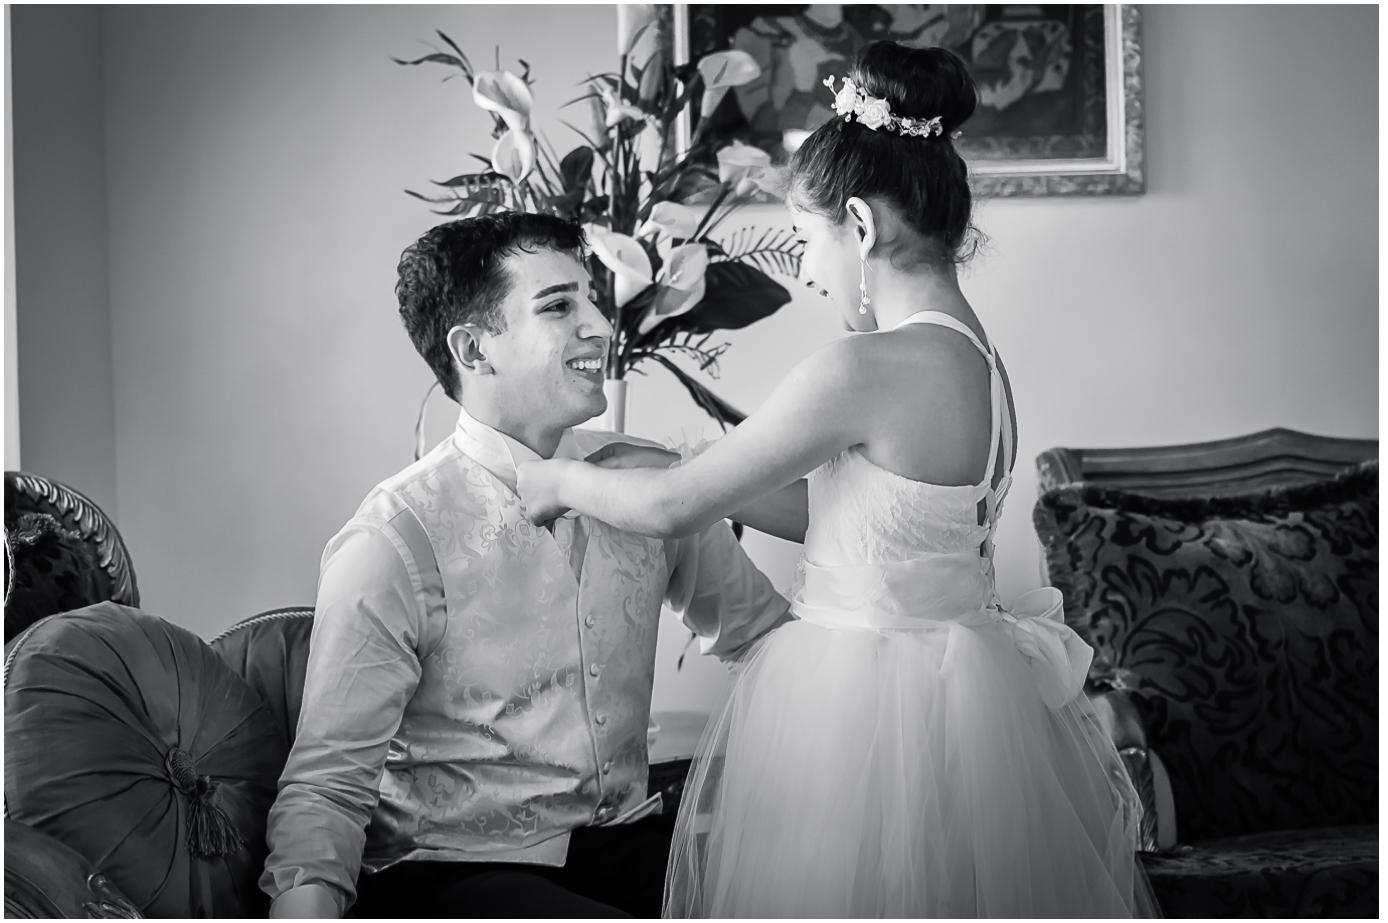 iranian wedding photographer 3 - Drapers Hall London Wedding Photographer